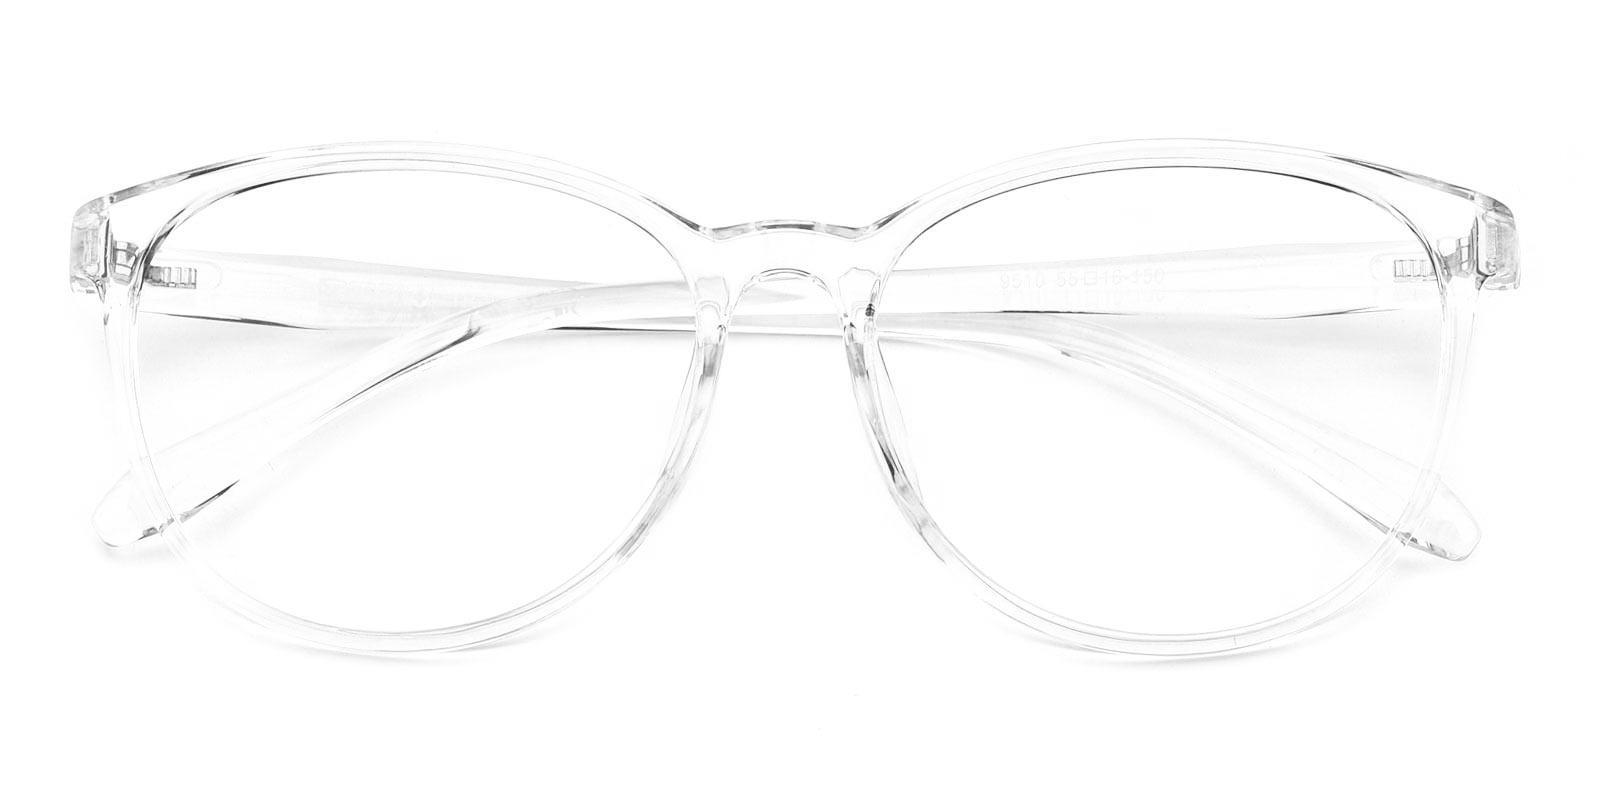 Jay-Translucent-Round-TR-Eyeglasses-detail